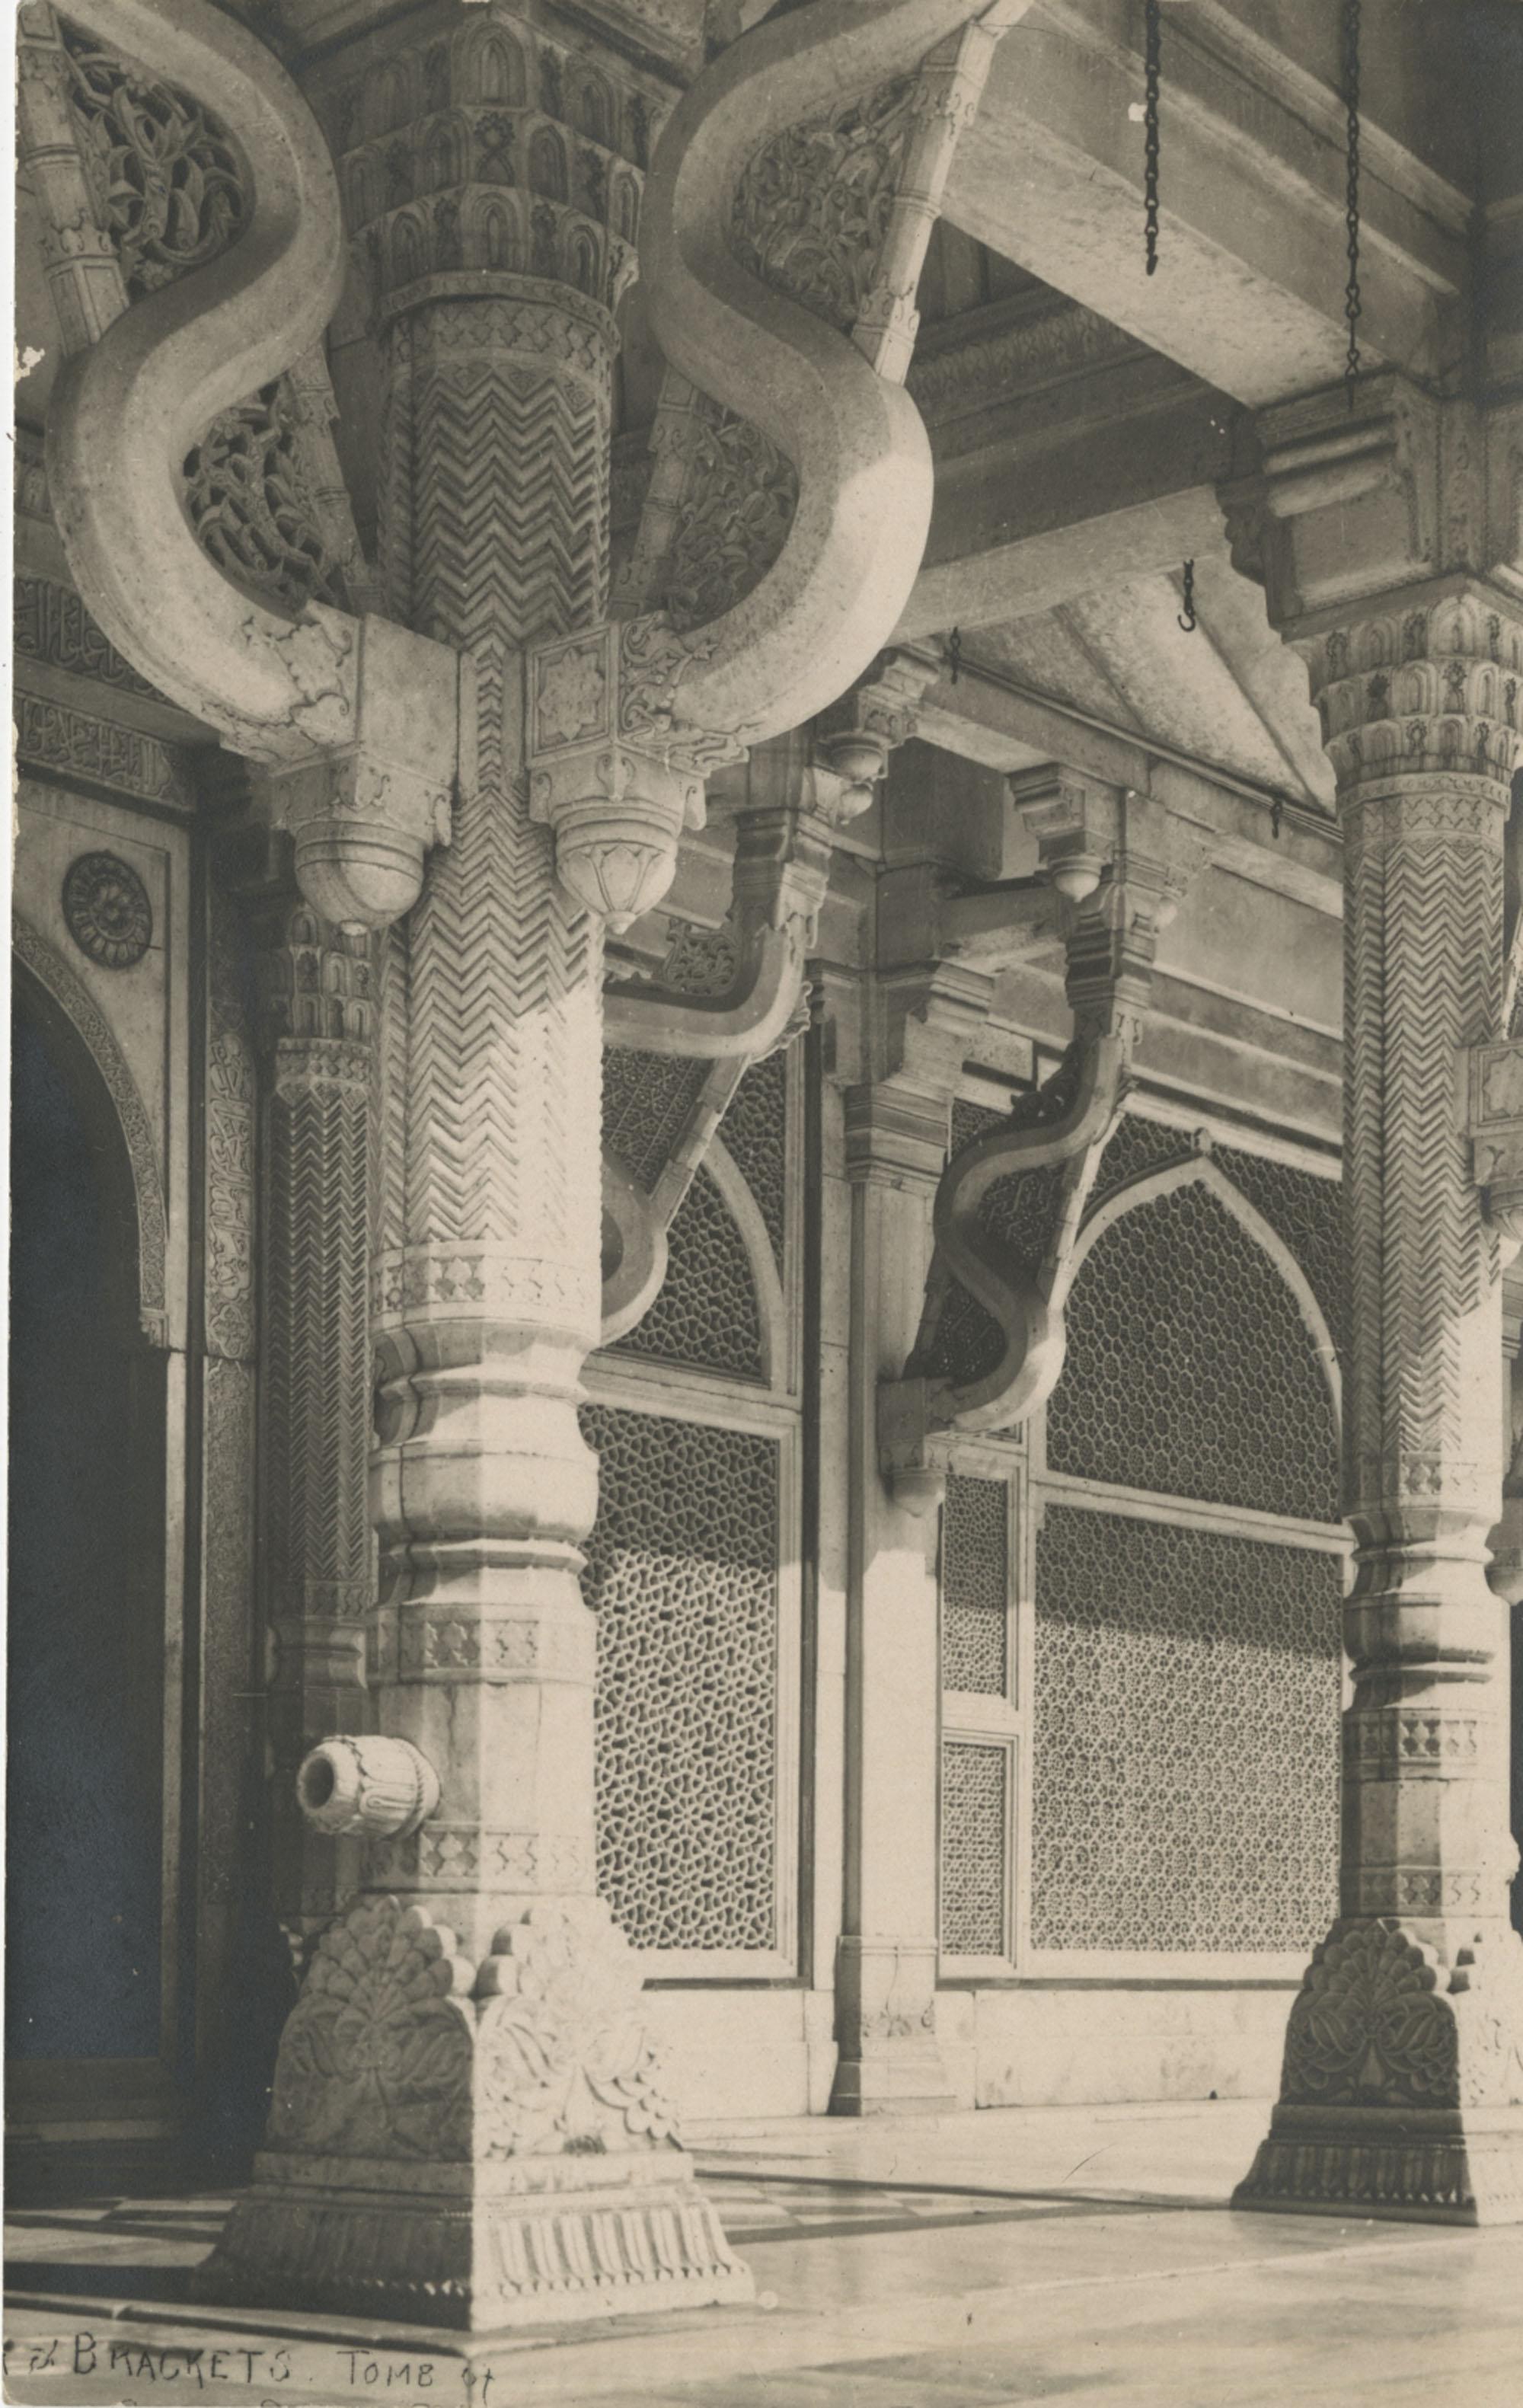 Pillars in 'Viaggo,' an Indian building